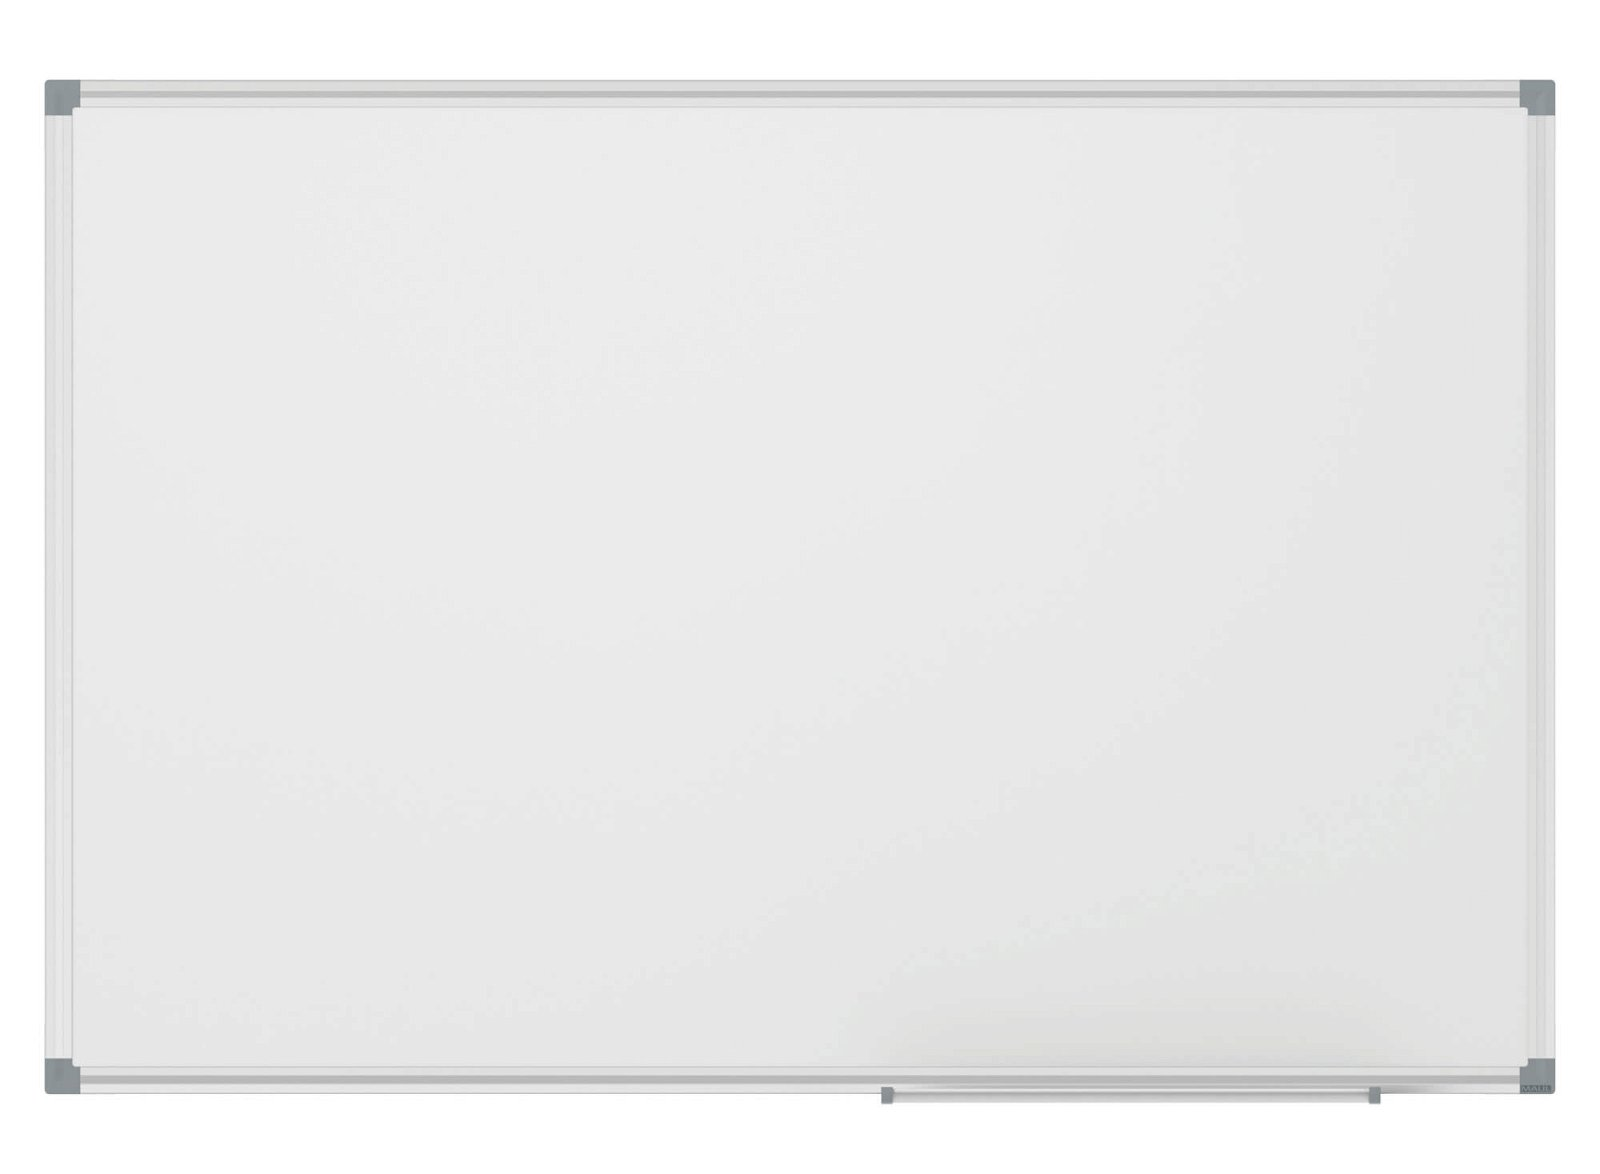 Whiteboard MAULstandard, Emaille, 120x240 cm, grau